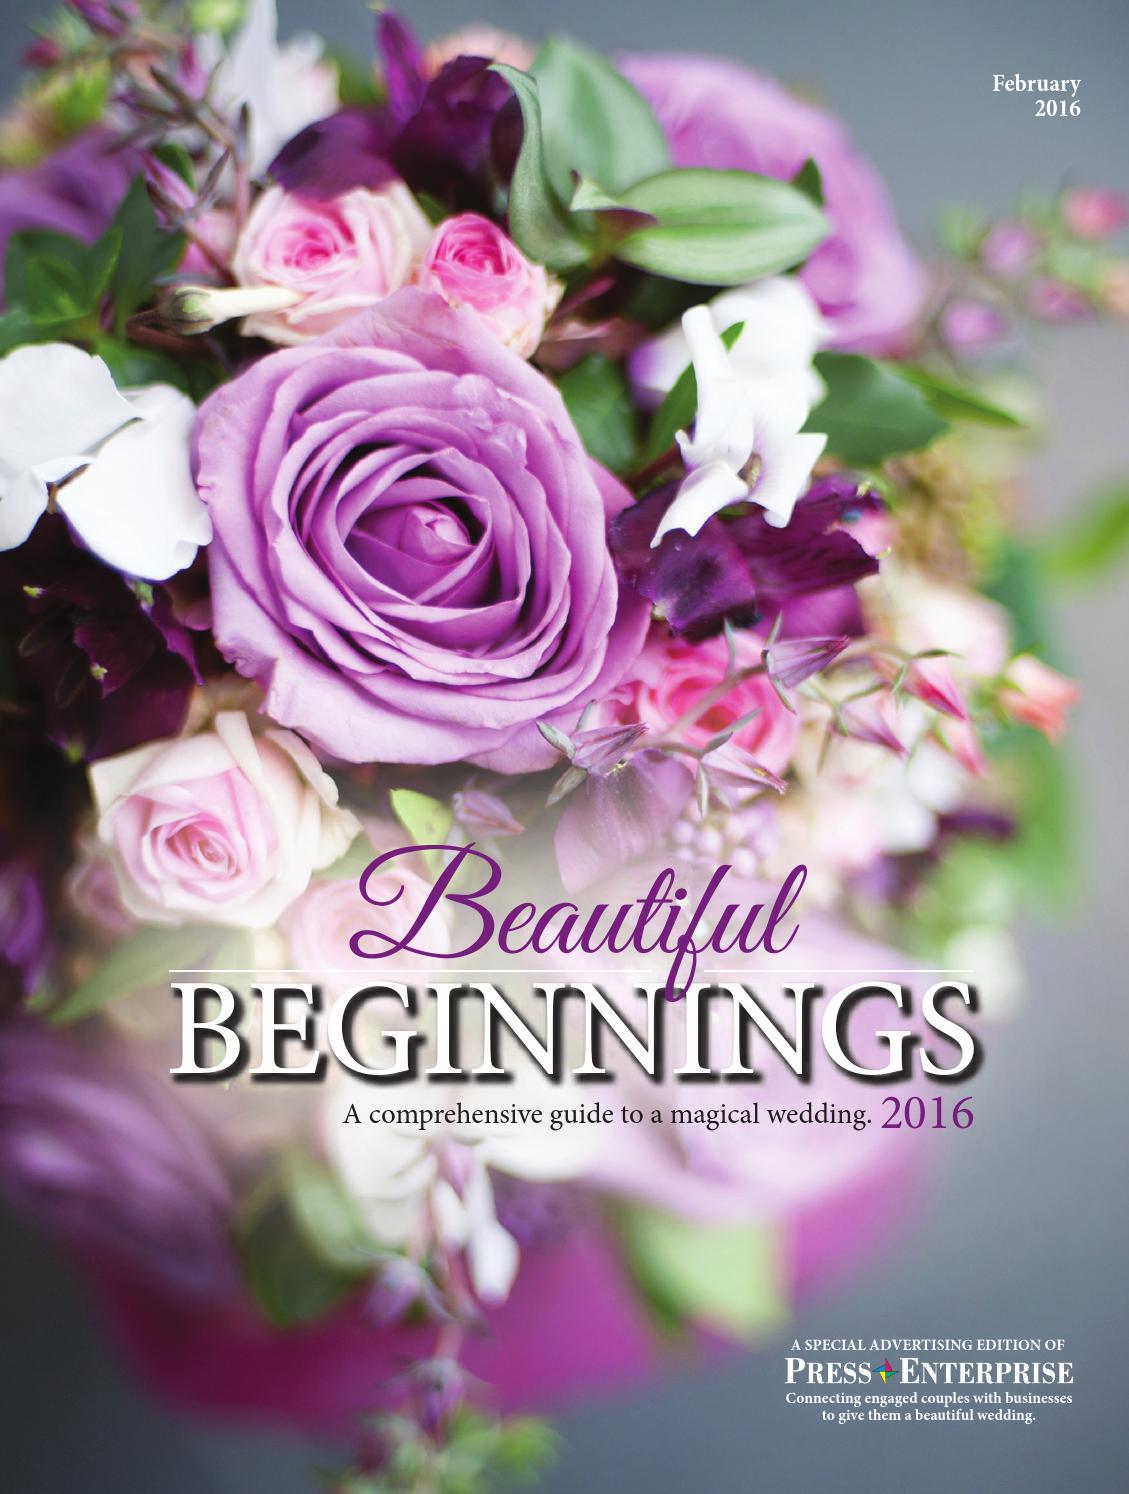 Beautiful beginnings 2016 bridal edition by press enterprise issuu izmirmasajfo